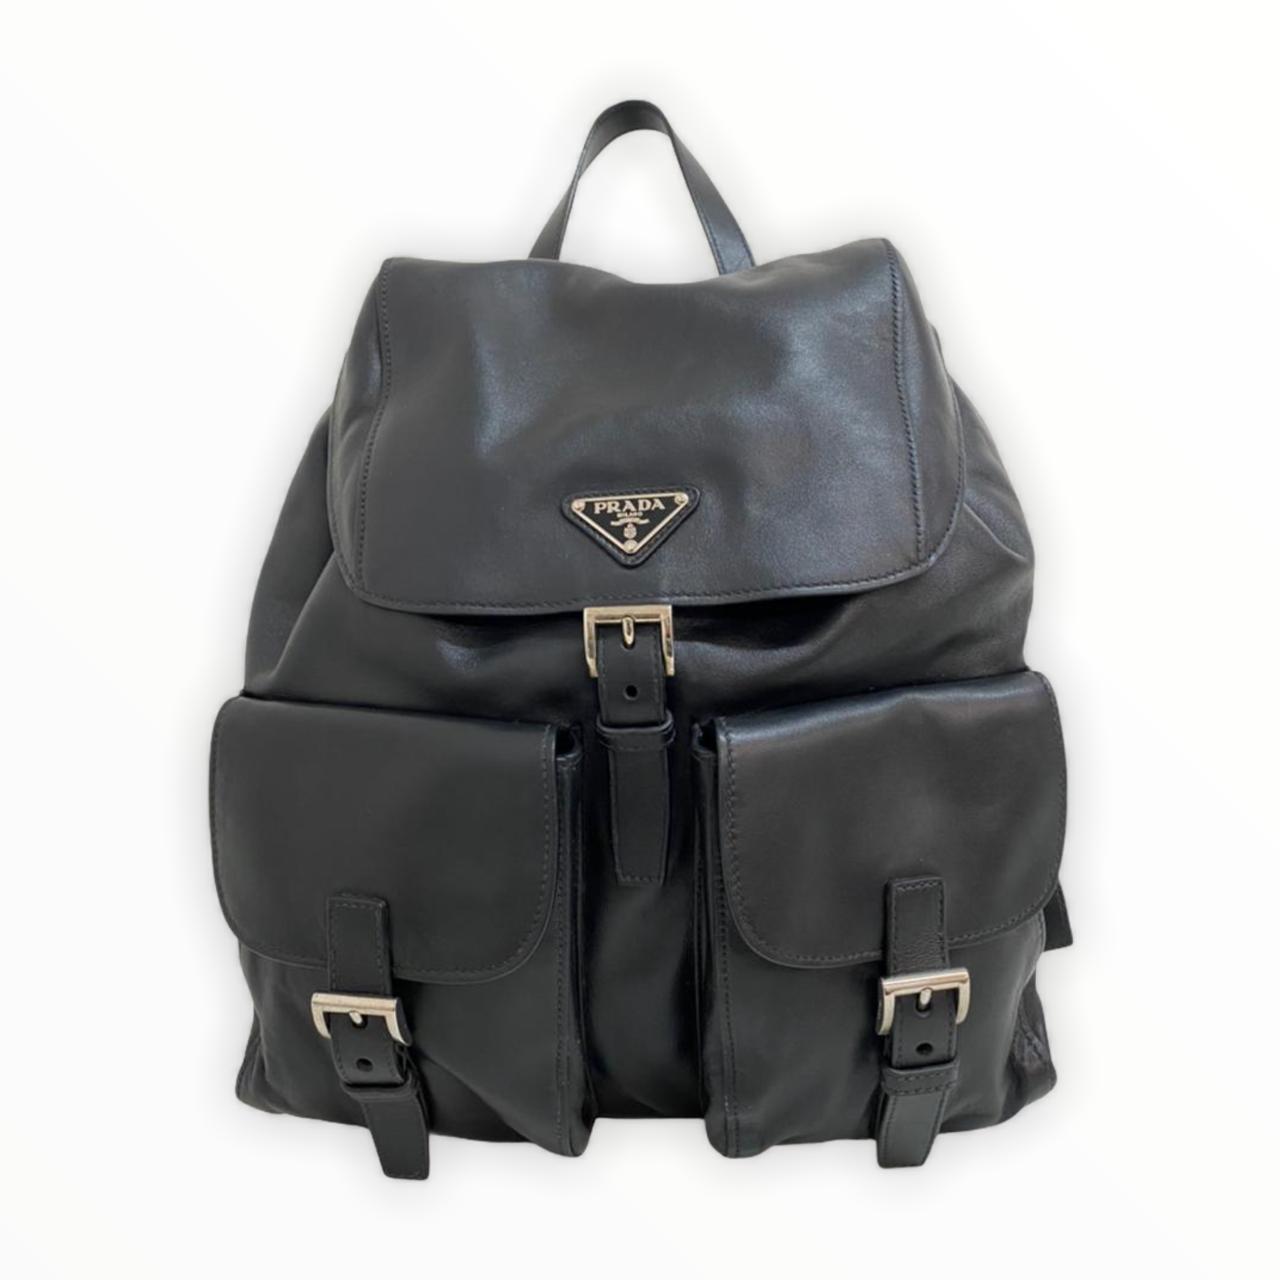 Mochila Prada Leather Preta